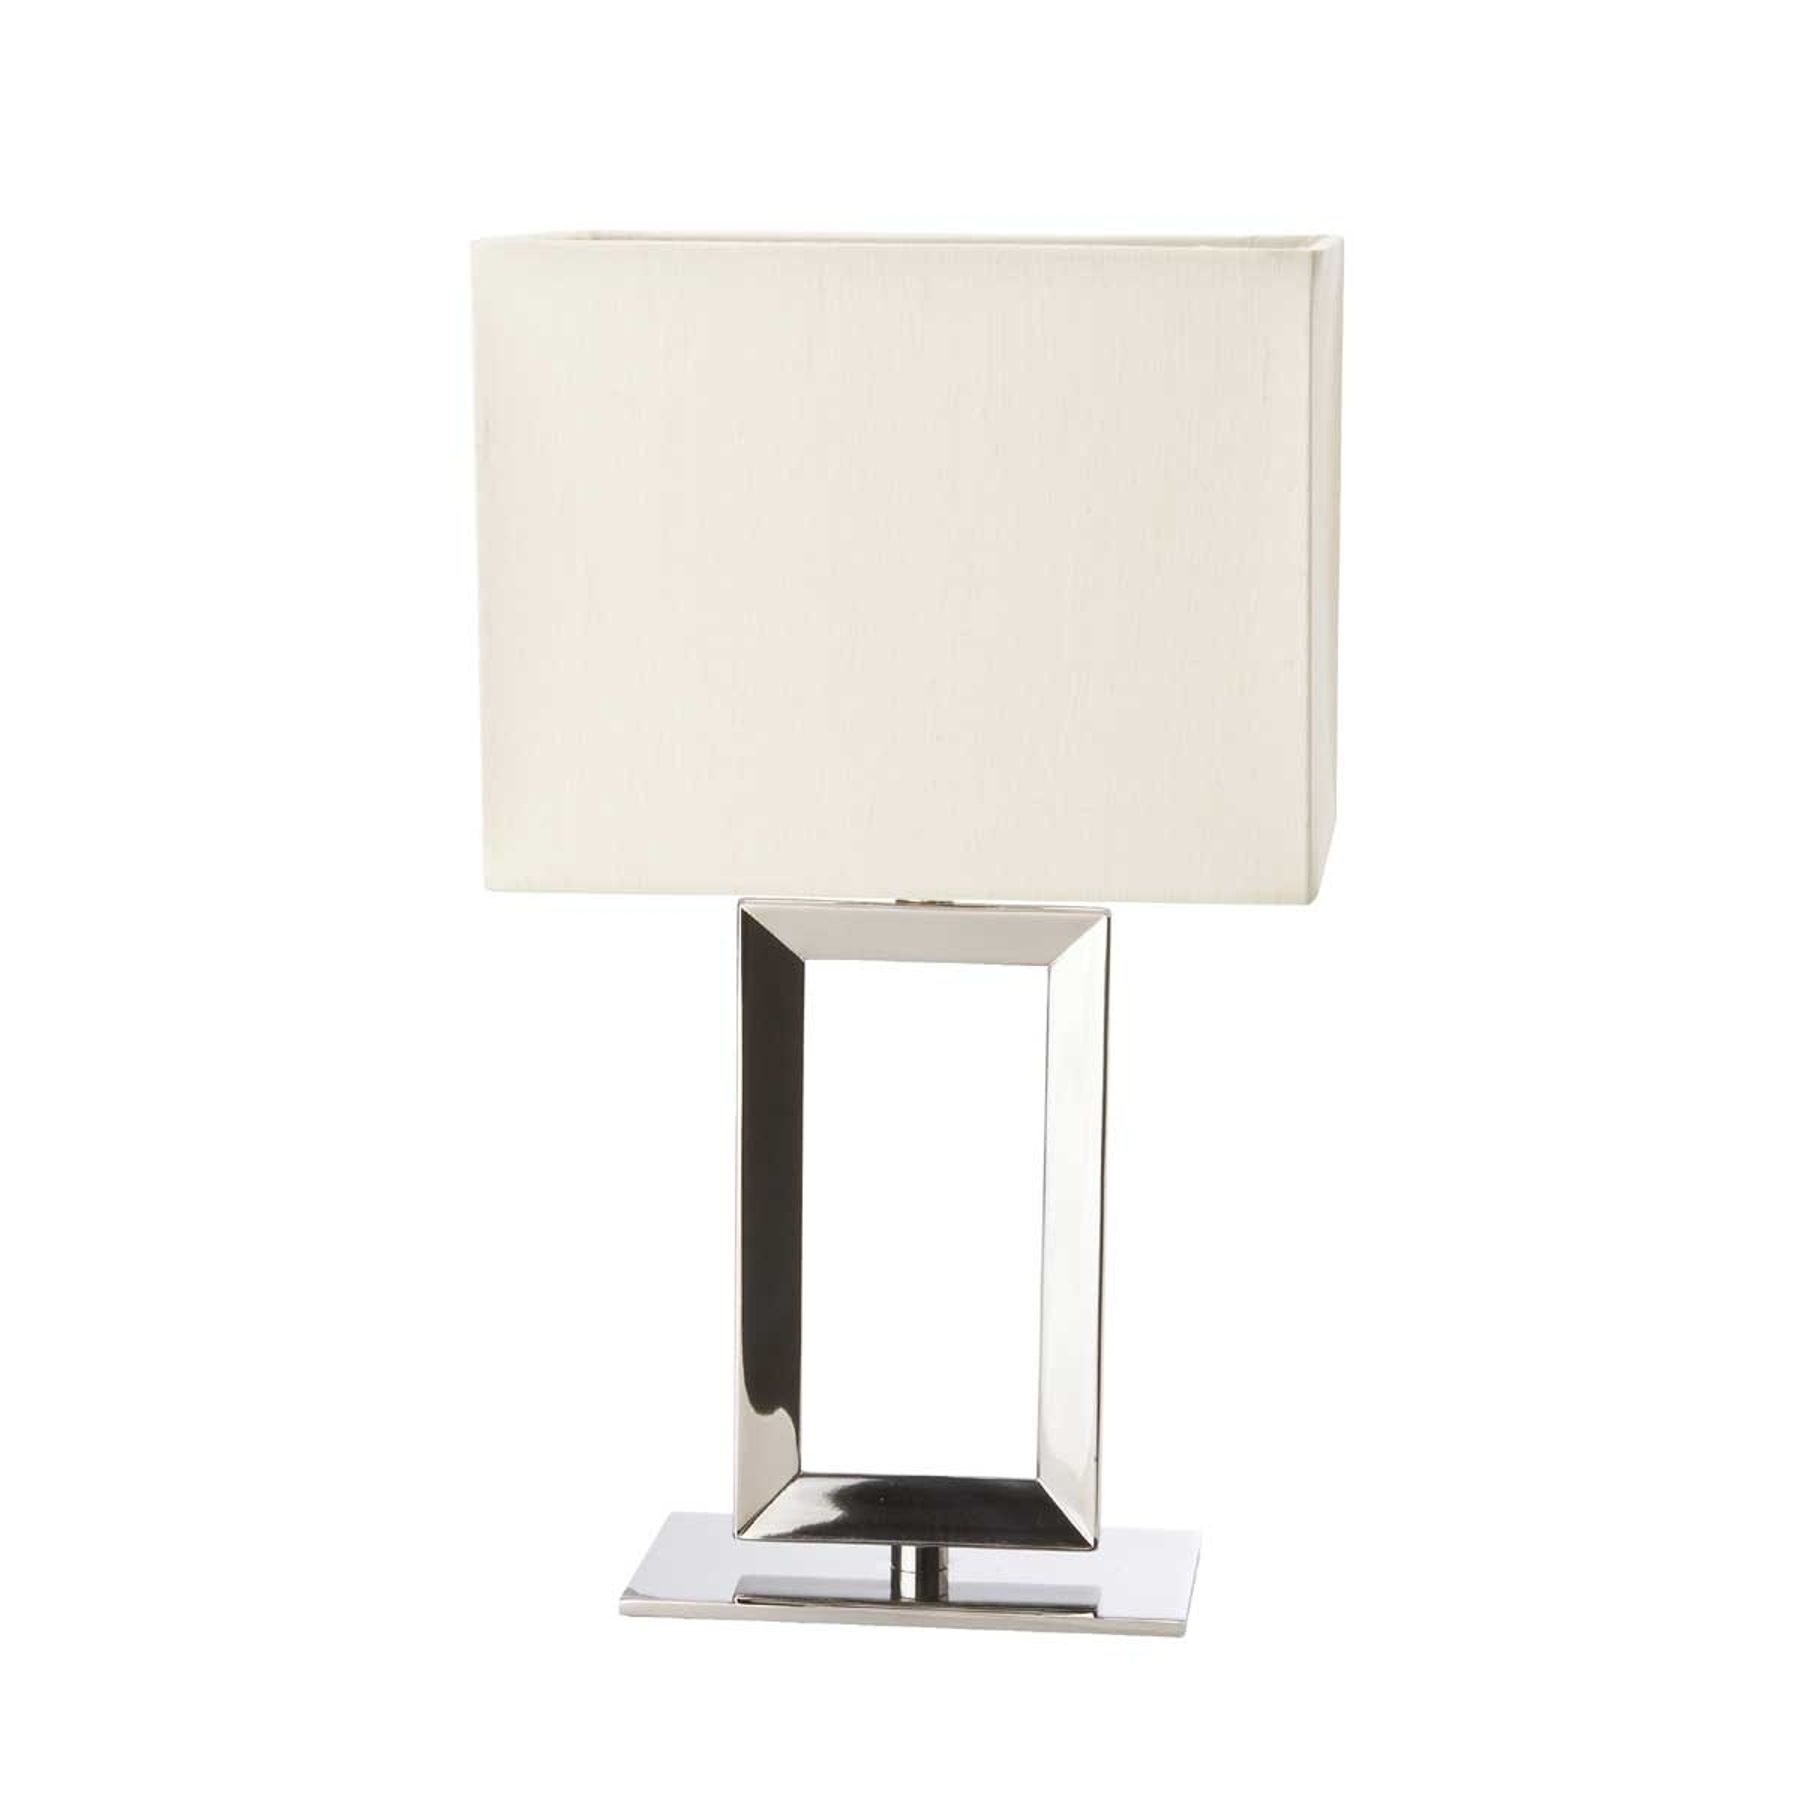 Kleine tafellamp PAD, 28,5 cm